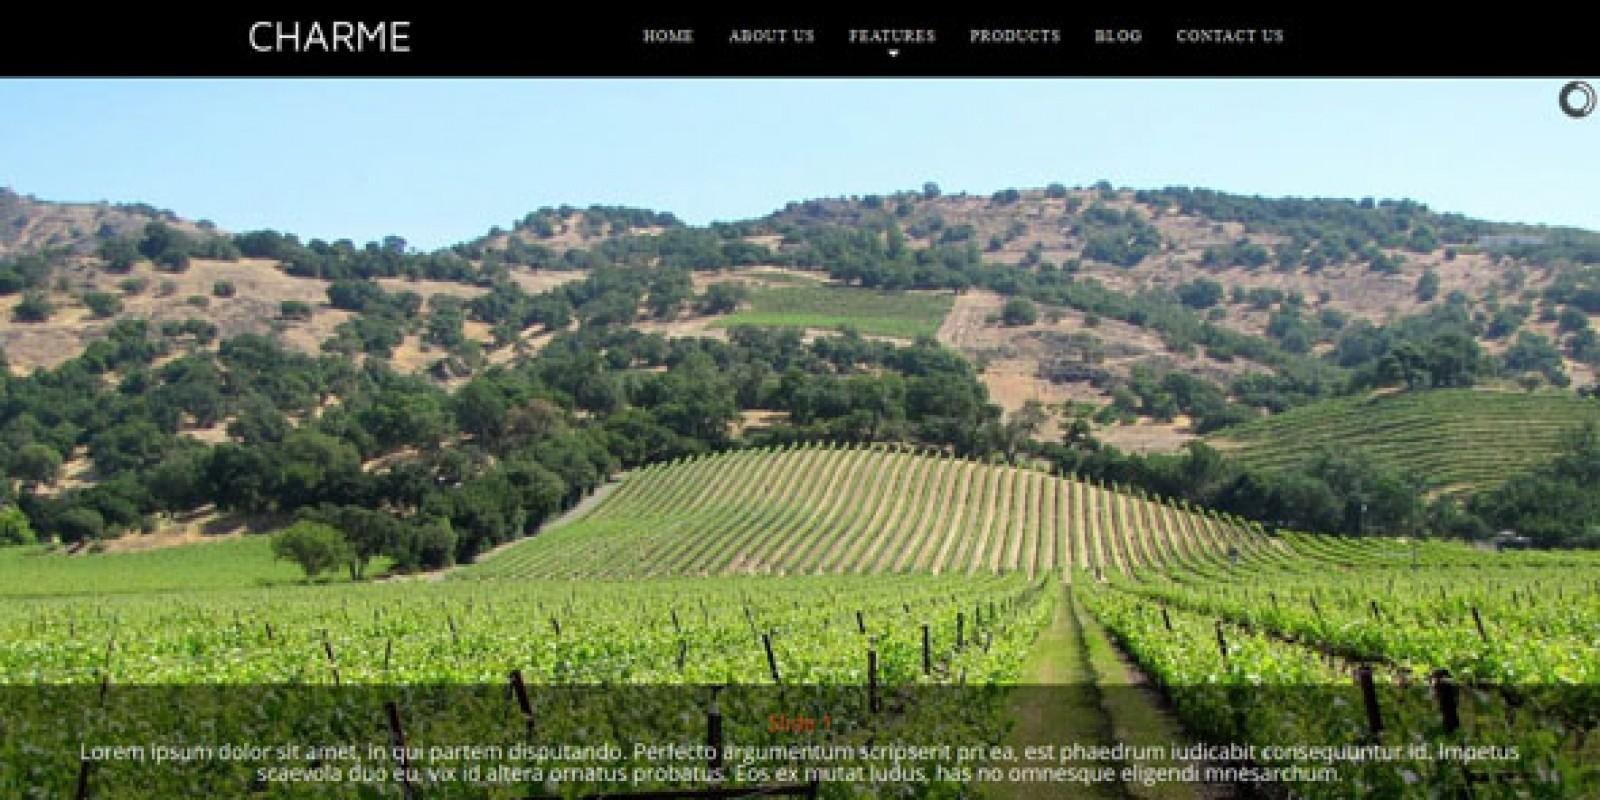 Charme - Winery And Wines WordPress Theme